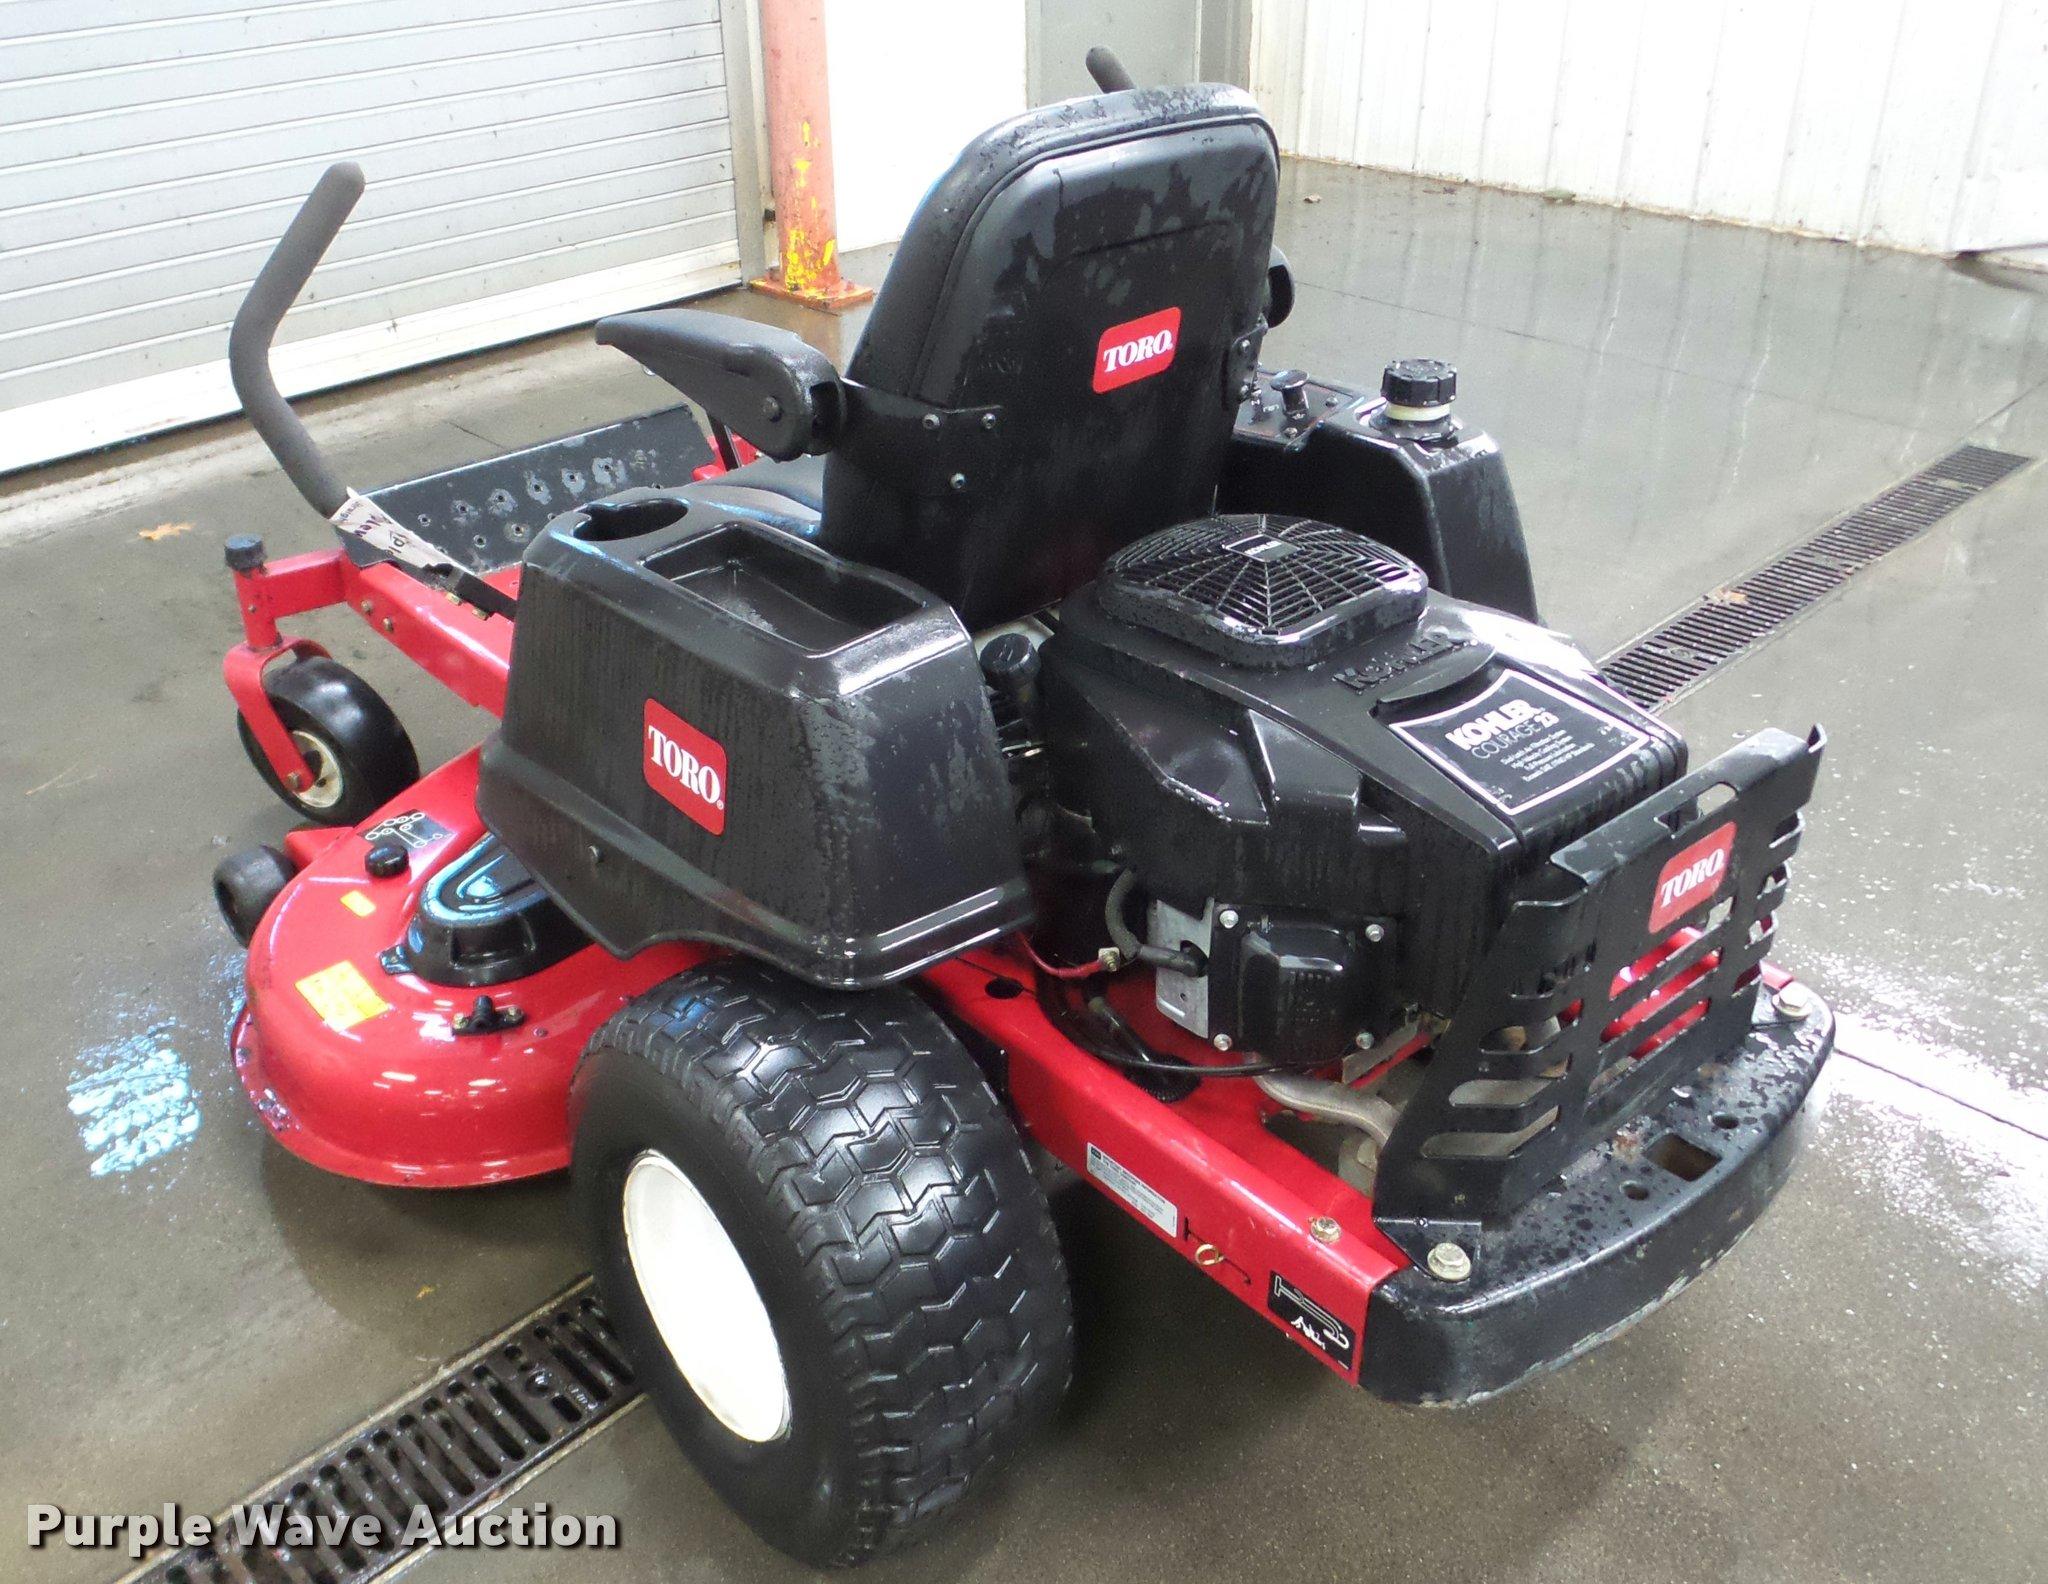 Toro Time Cutter Z5020 ZTR lawn mower   Item DA1795   SOLD!